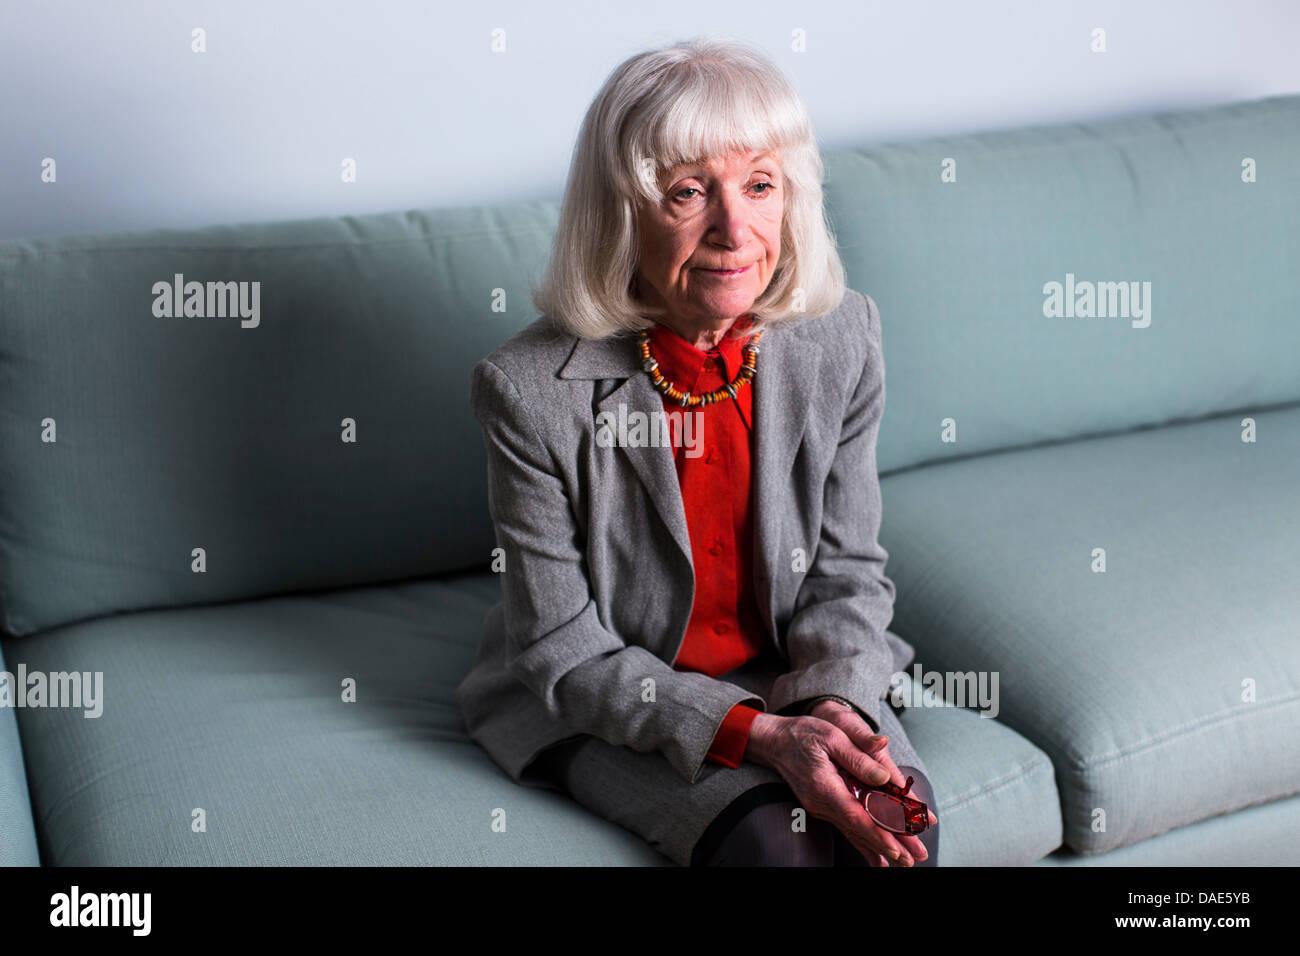 Ältere Frau sitzend auf Sofa mit leeren Ausdruck Stockbild